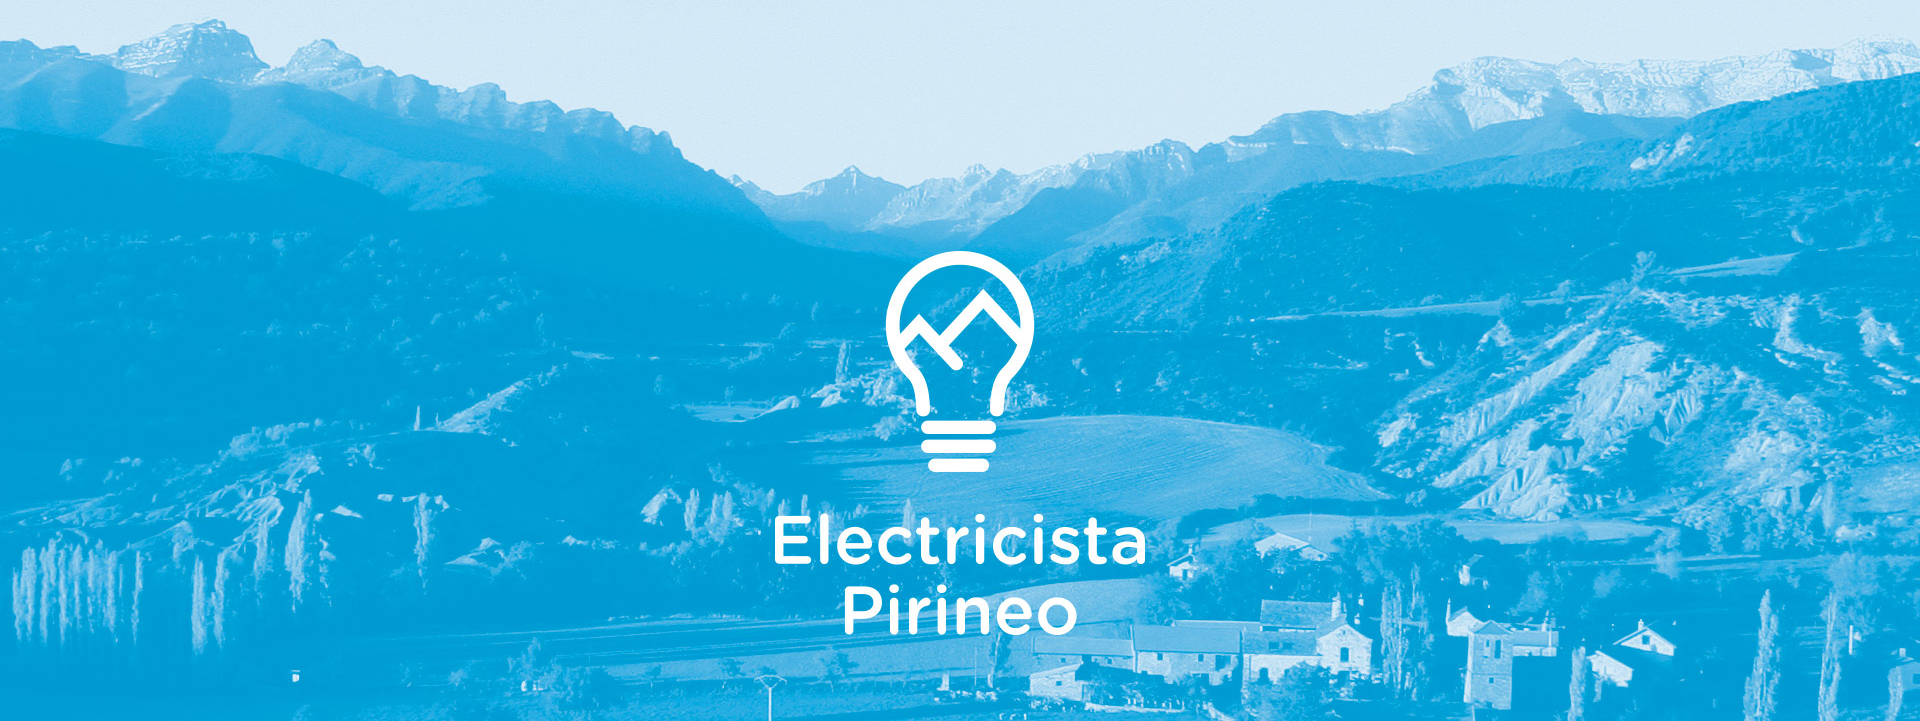 http://electricistapirineo.com/wp-content/uploads/2015/10/ElectricistaPirineo02.jpg